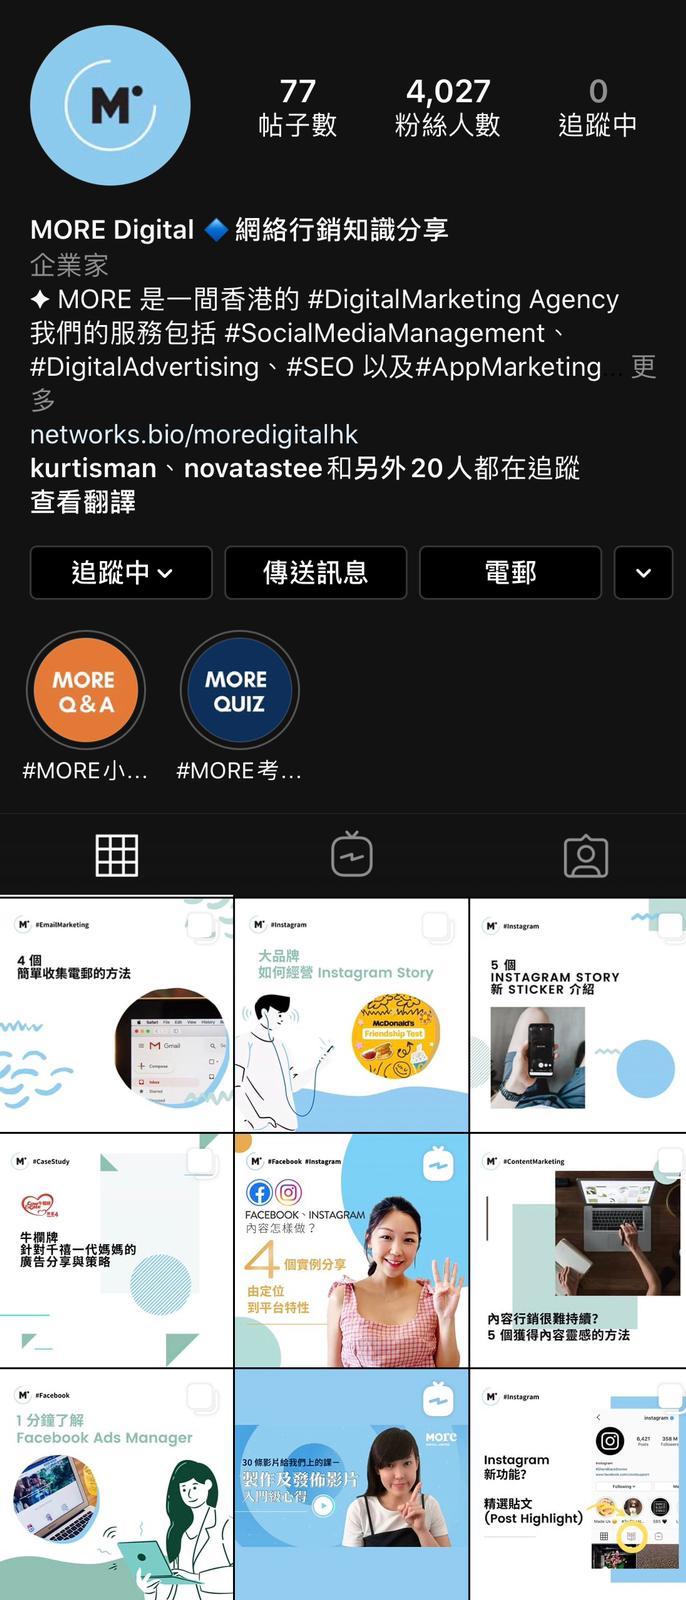 MORE Digital IG New Profile